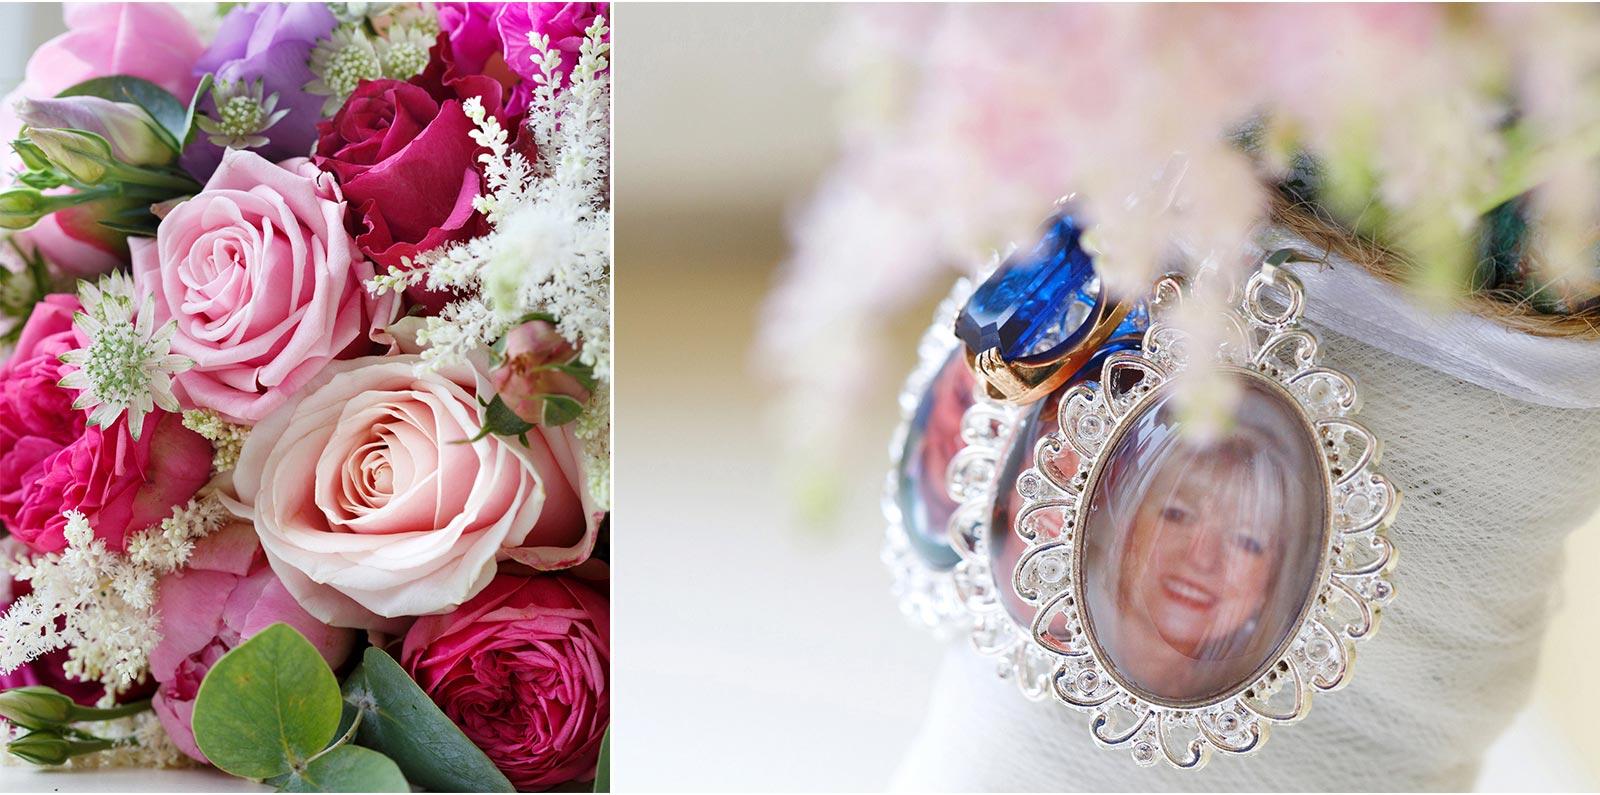 Wedding flowers with photo momento